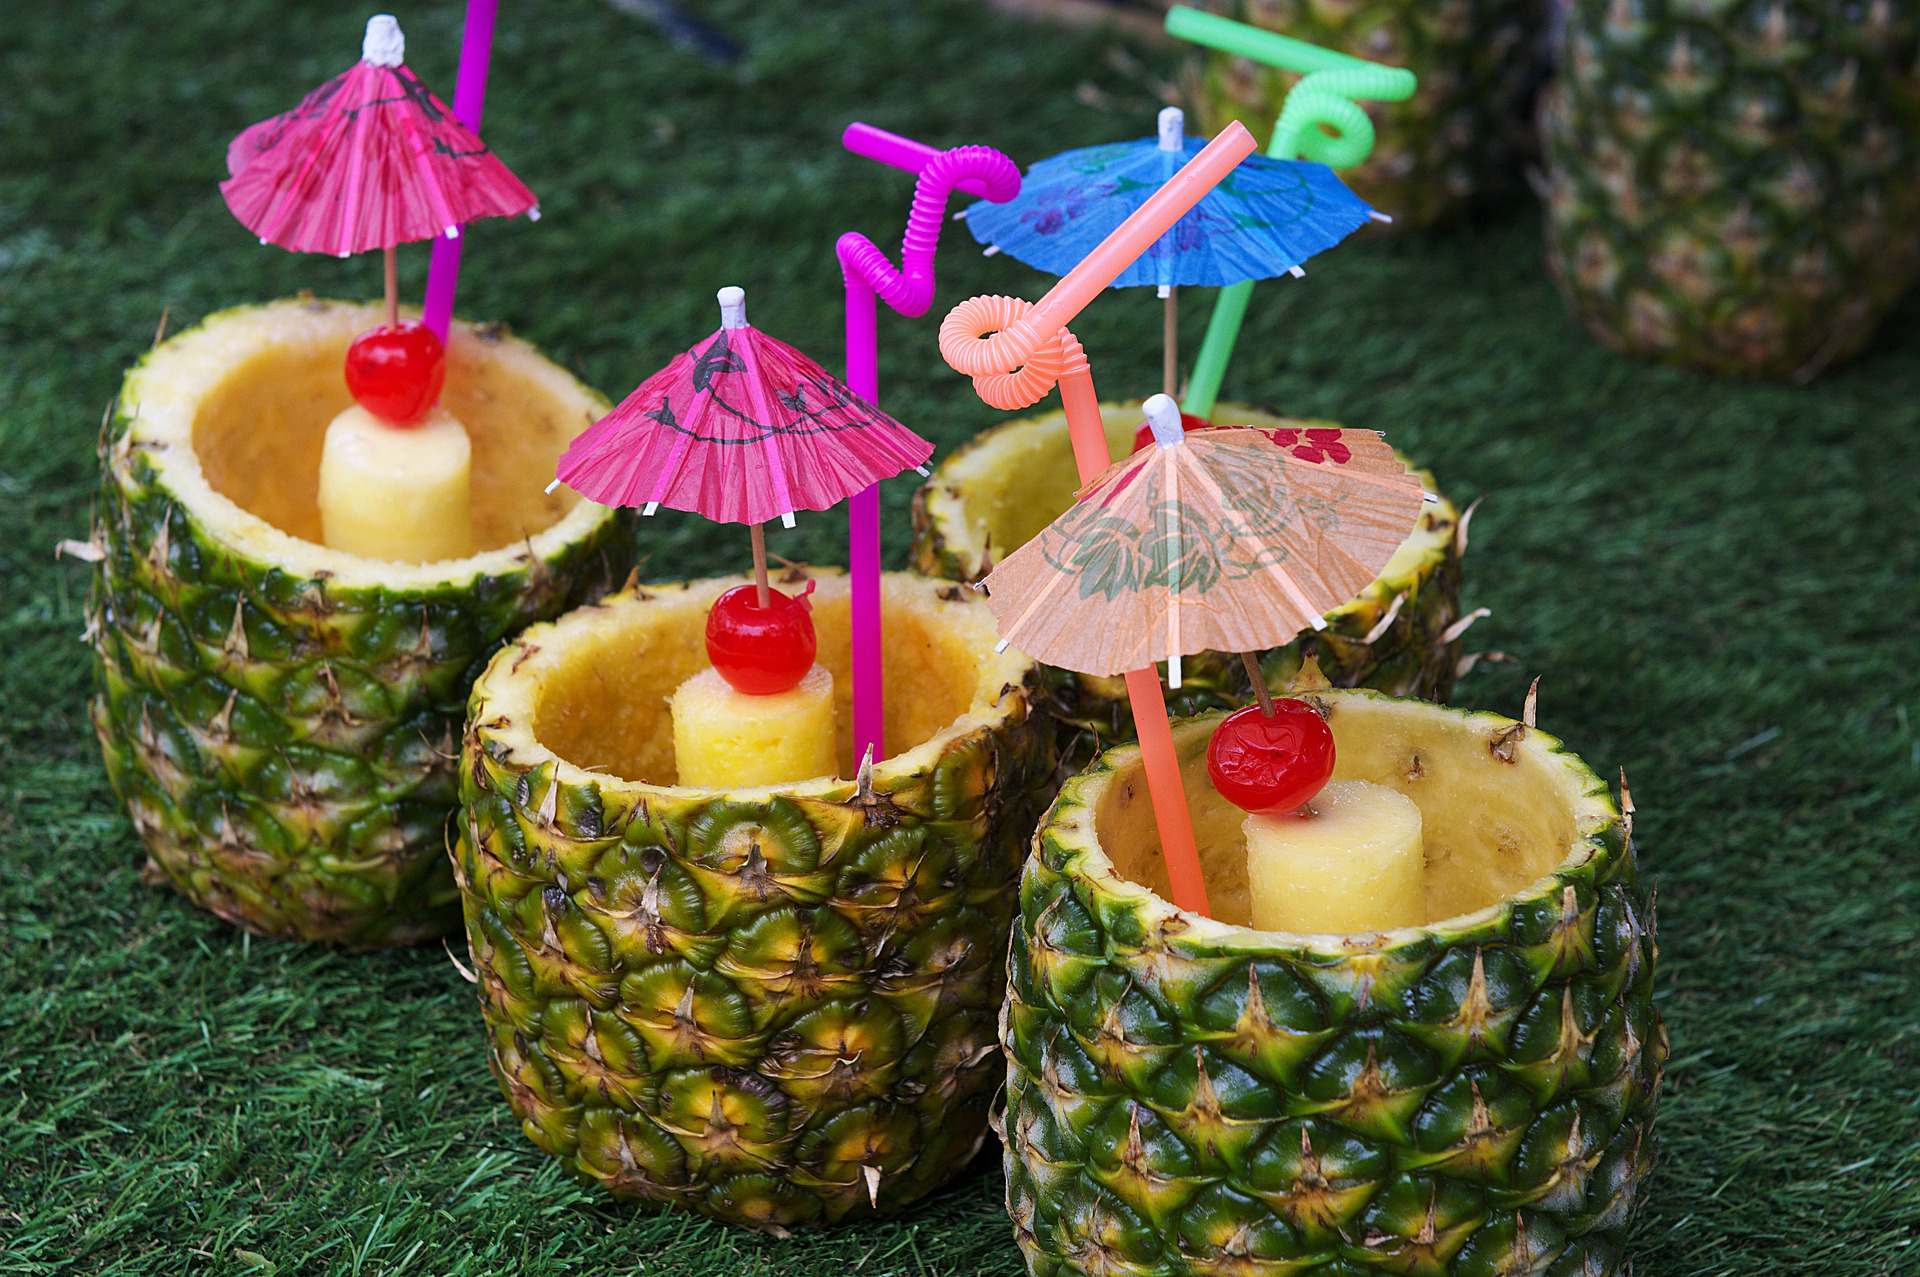 Spicy Pineapple Zutaten